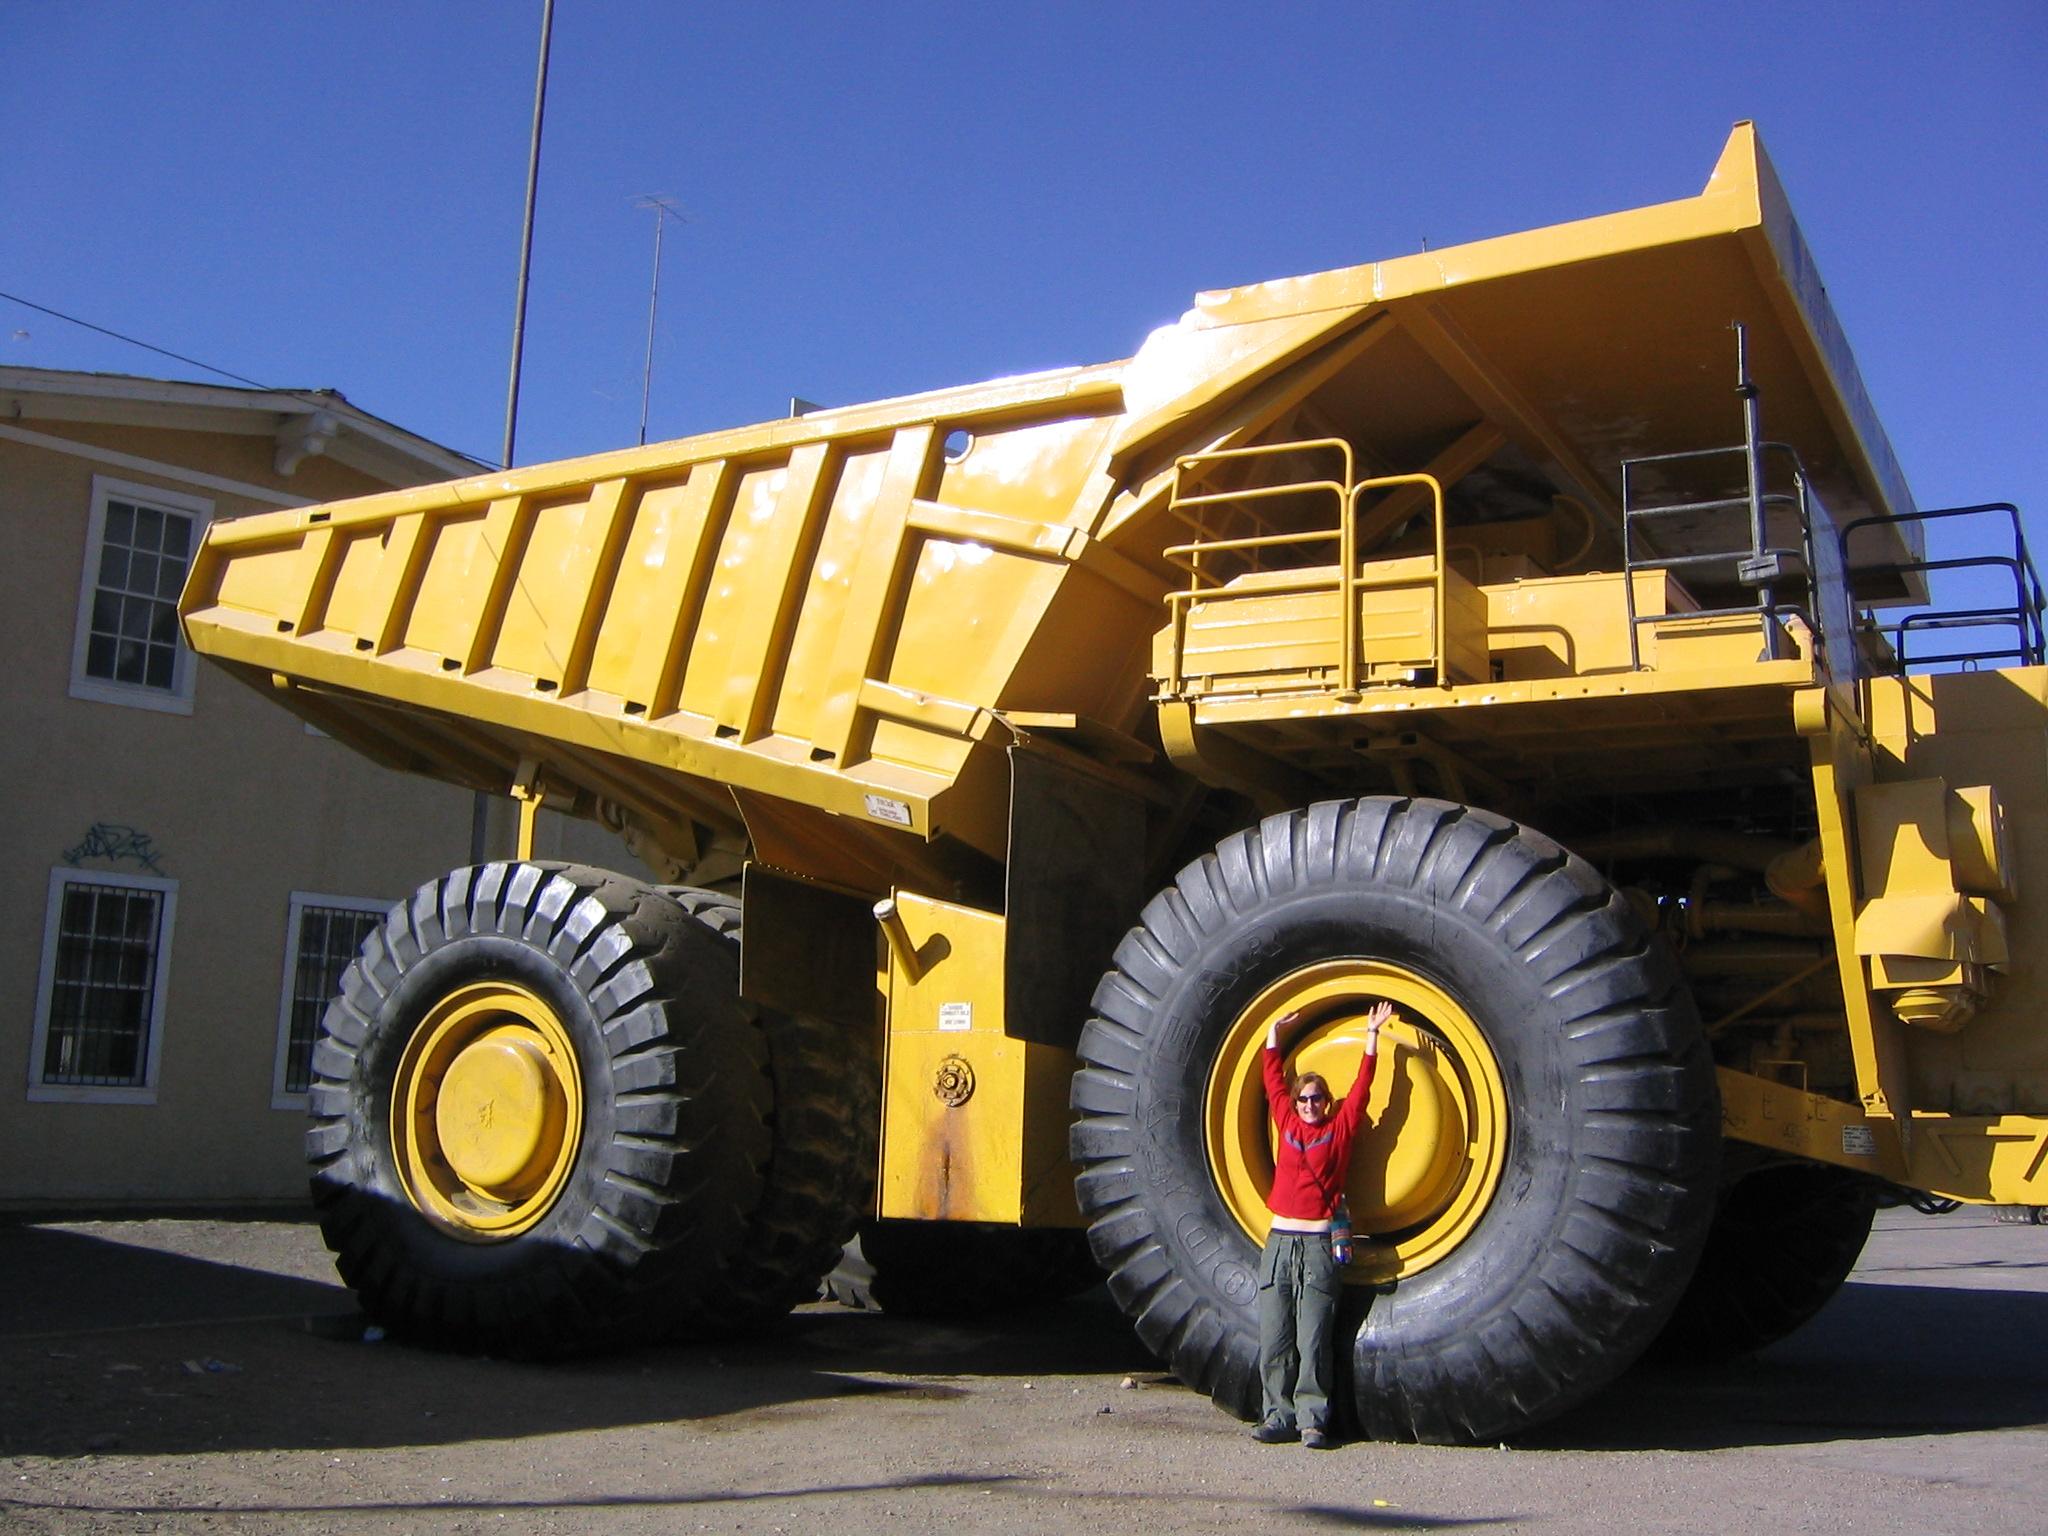 Big_South_American_dump_truck.jpg